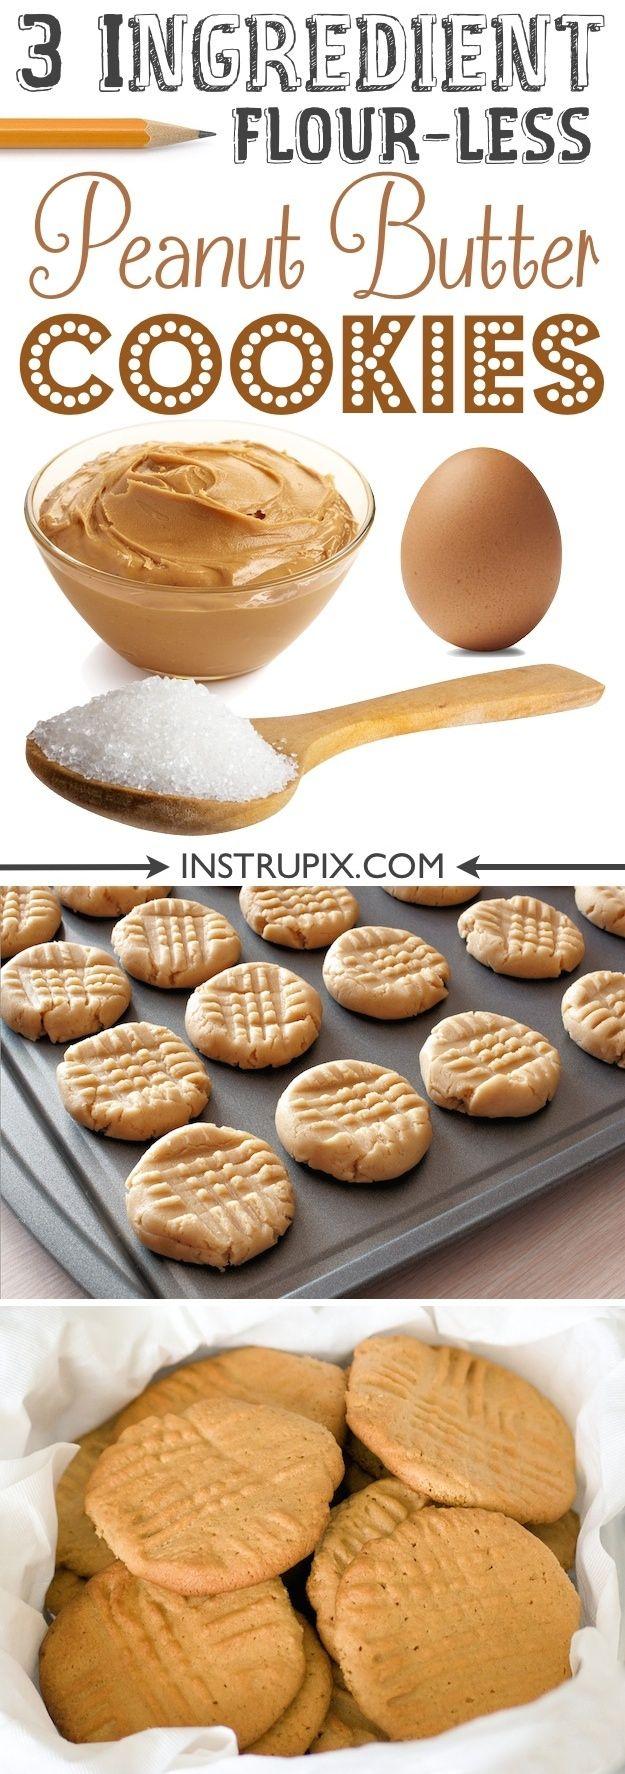 Easy flour-less peanut butter cookies recipe-- just 3 ingredients! Easy peanut butter dessert and treat. Instrupix.com